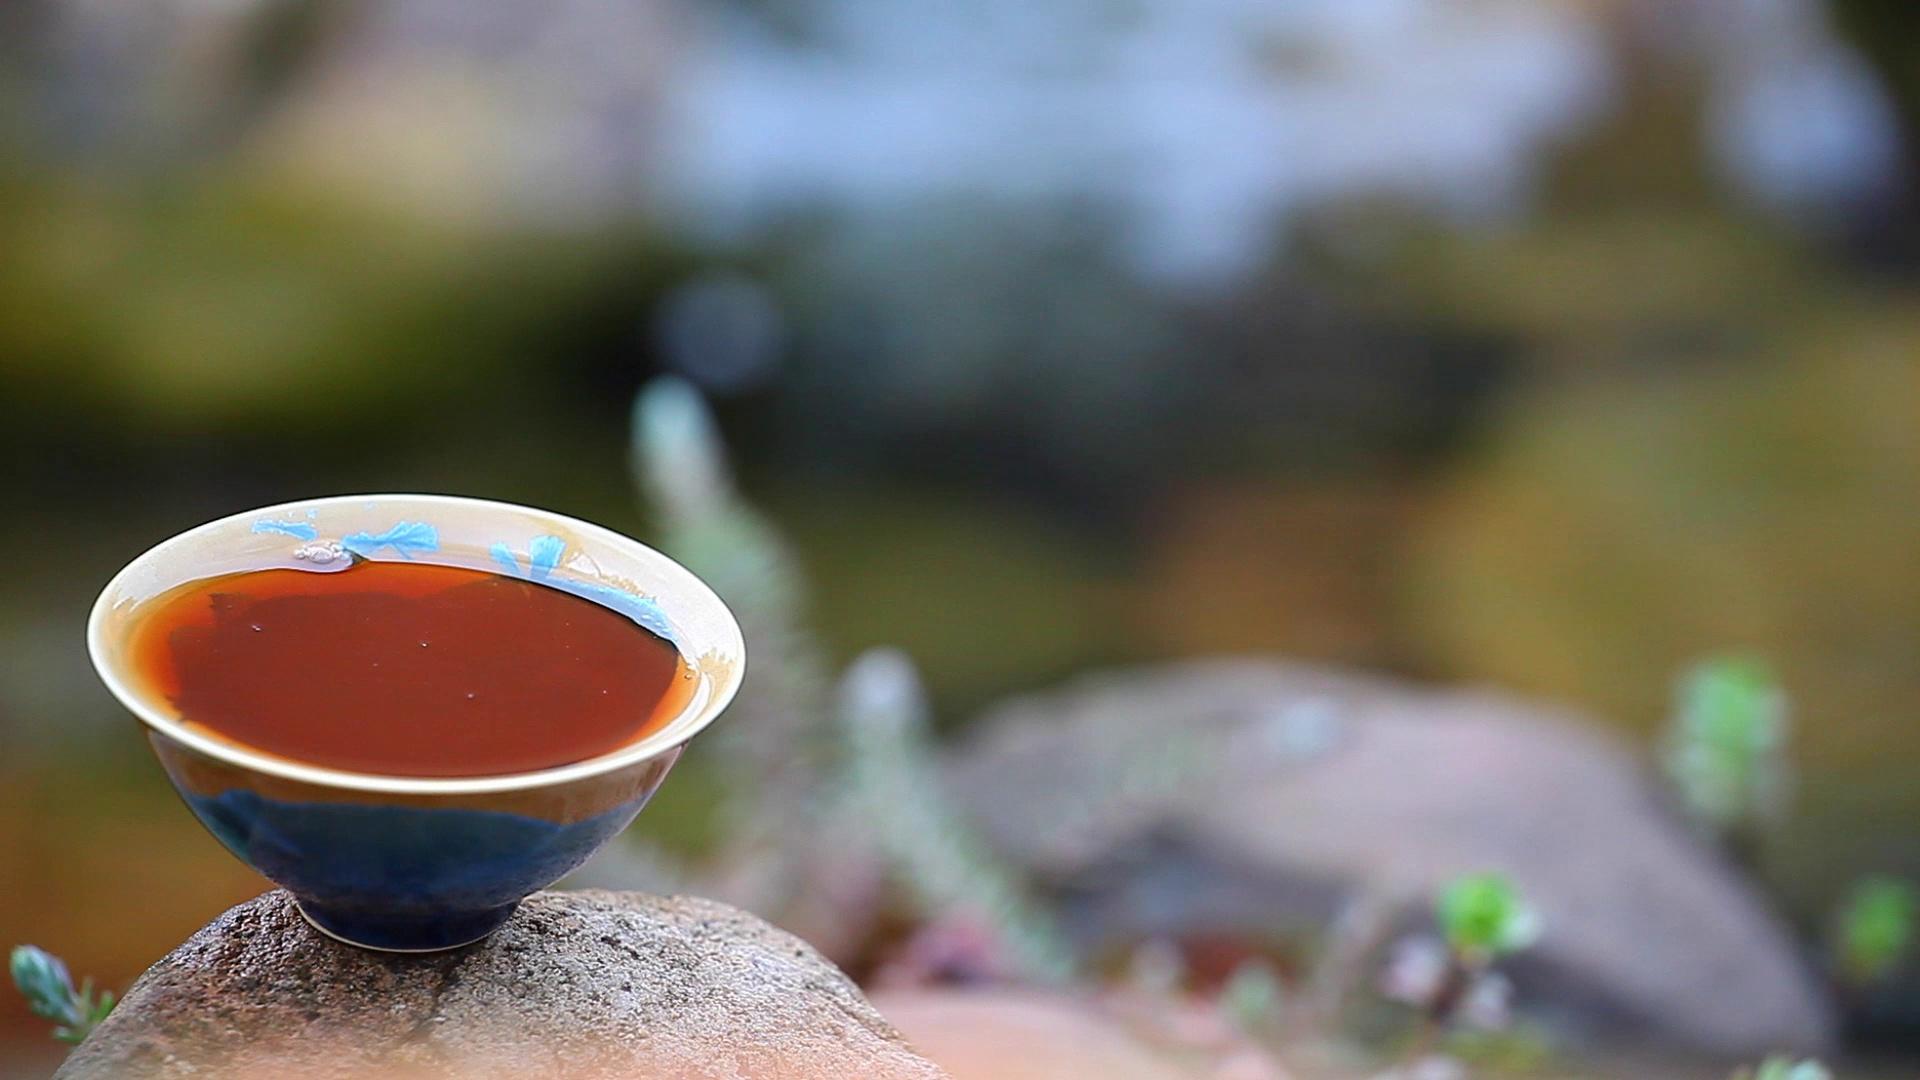 black-chinese-tea-run-river-footage-089410961_prevstill.jpeg